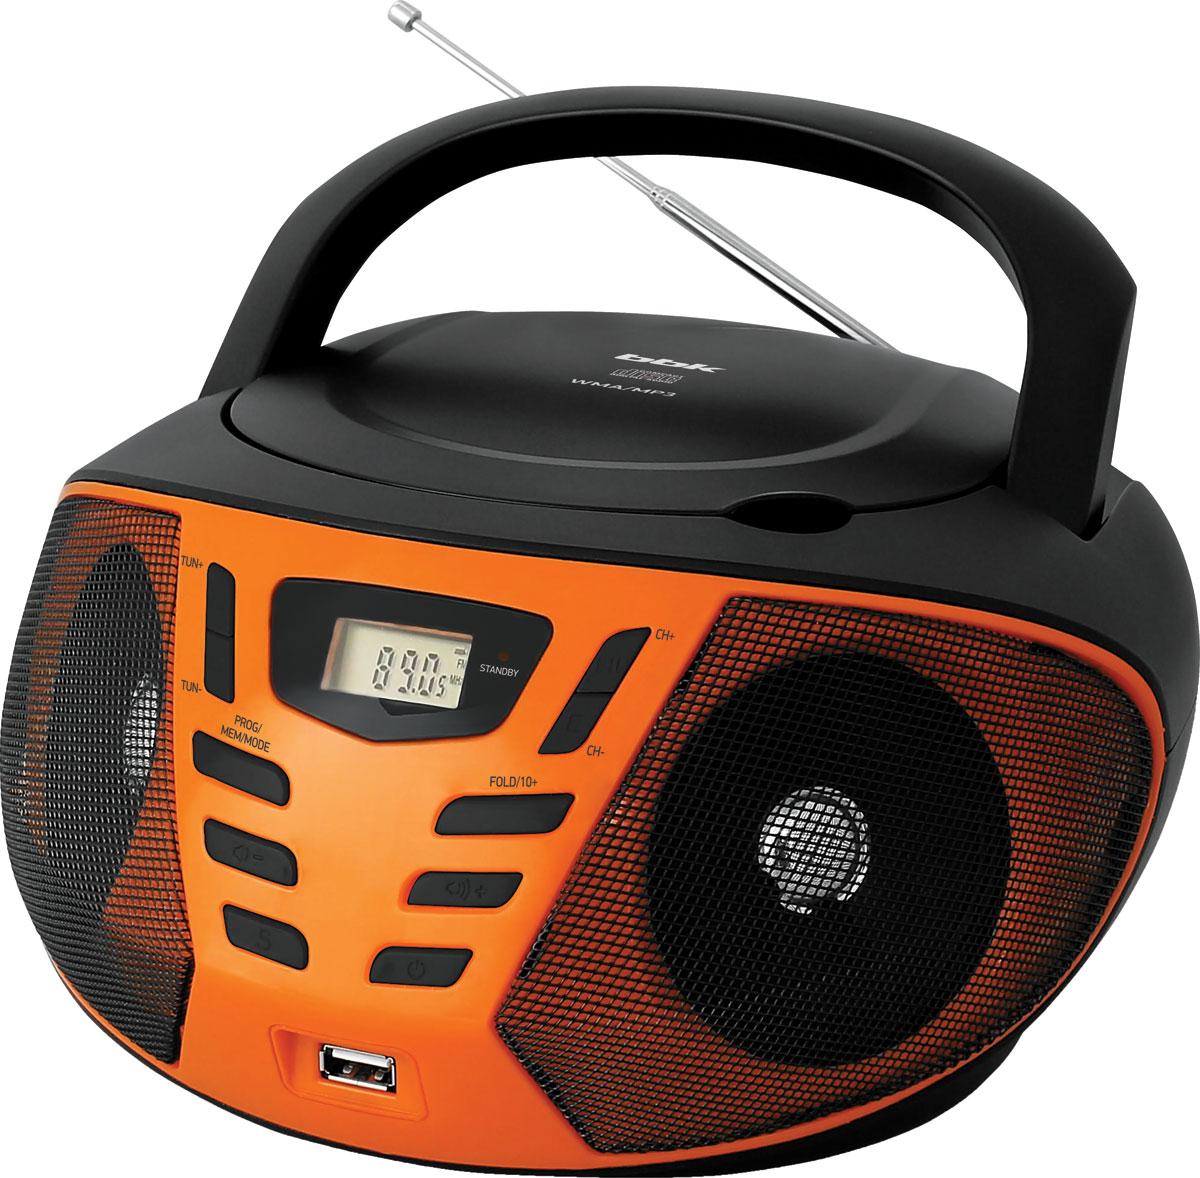 Магнитола BBK BX193U, Black Orange CD/MP3 магнитола bbk bx193u white orange